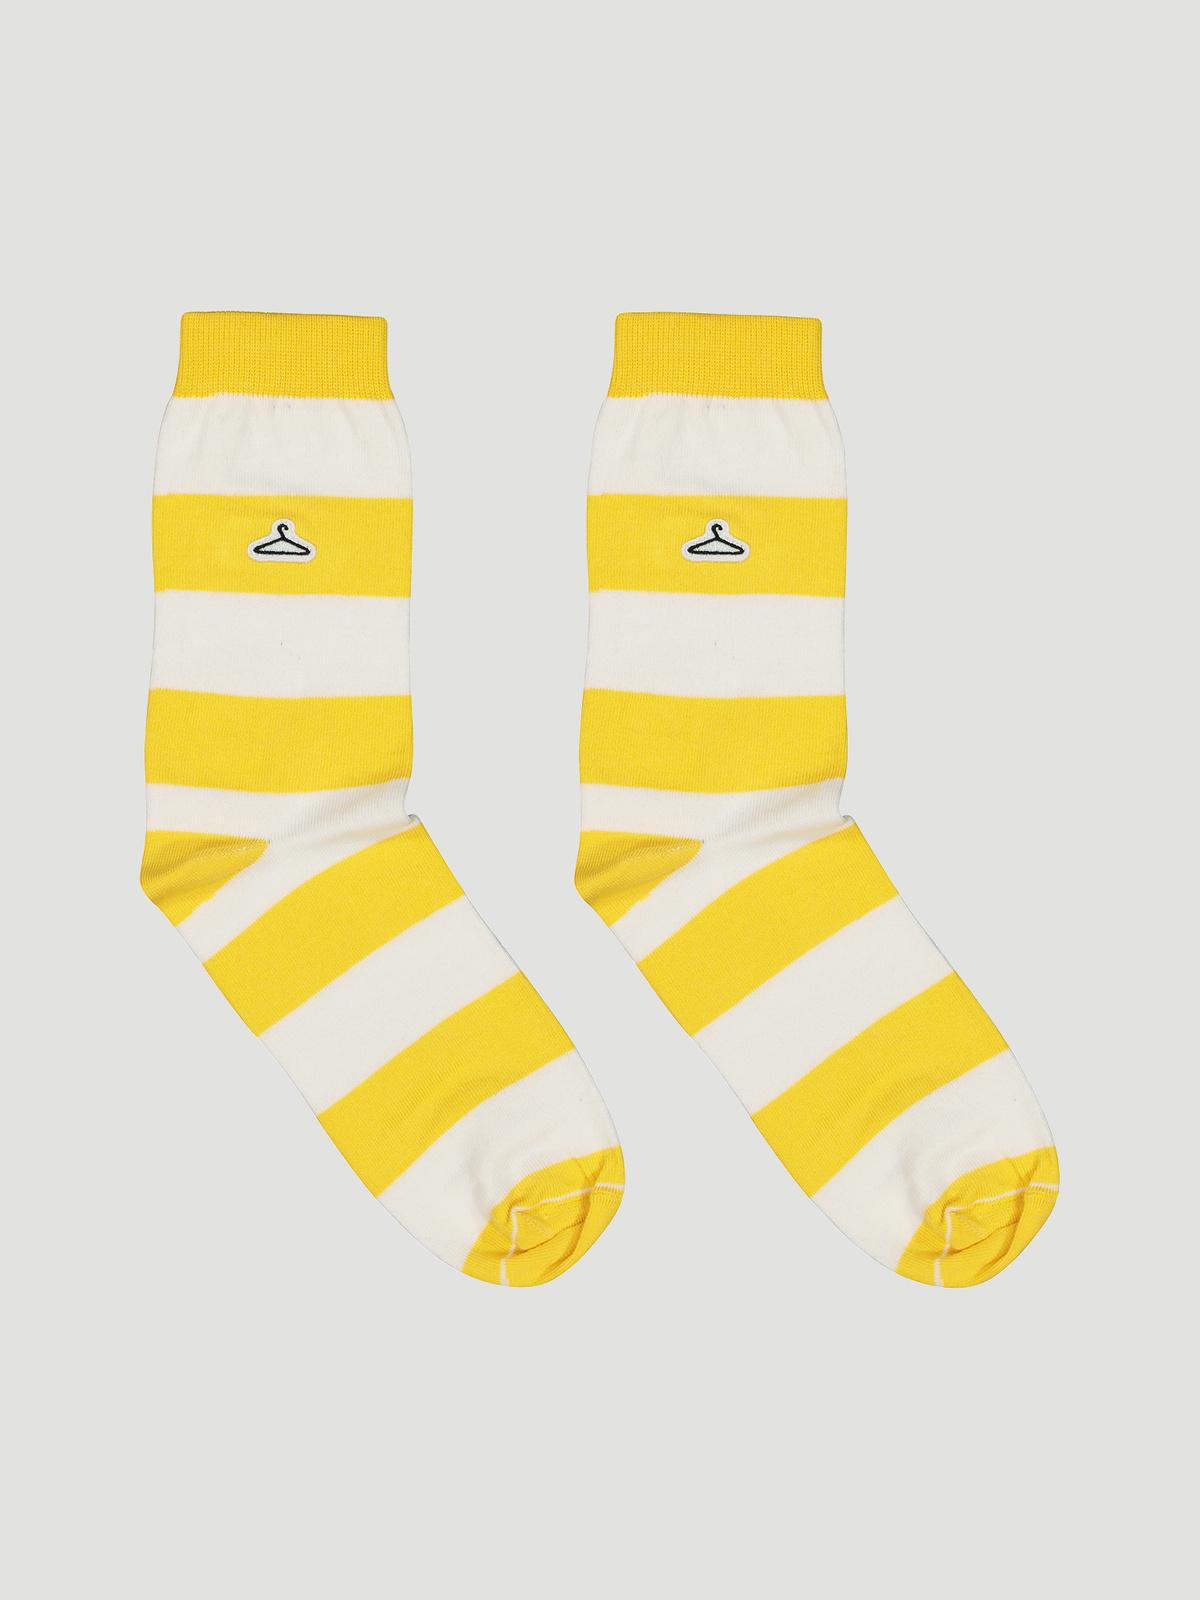 Hanger Striped Sock Yellow White 0